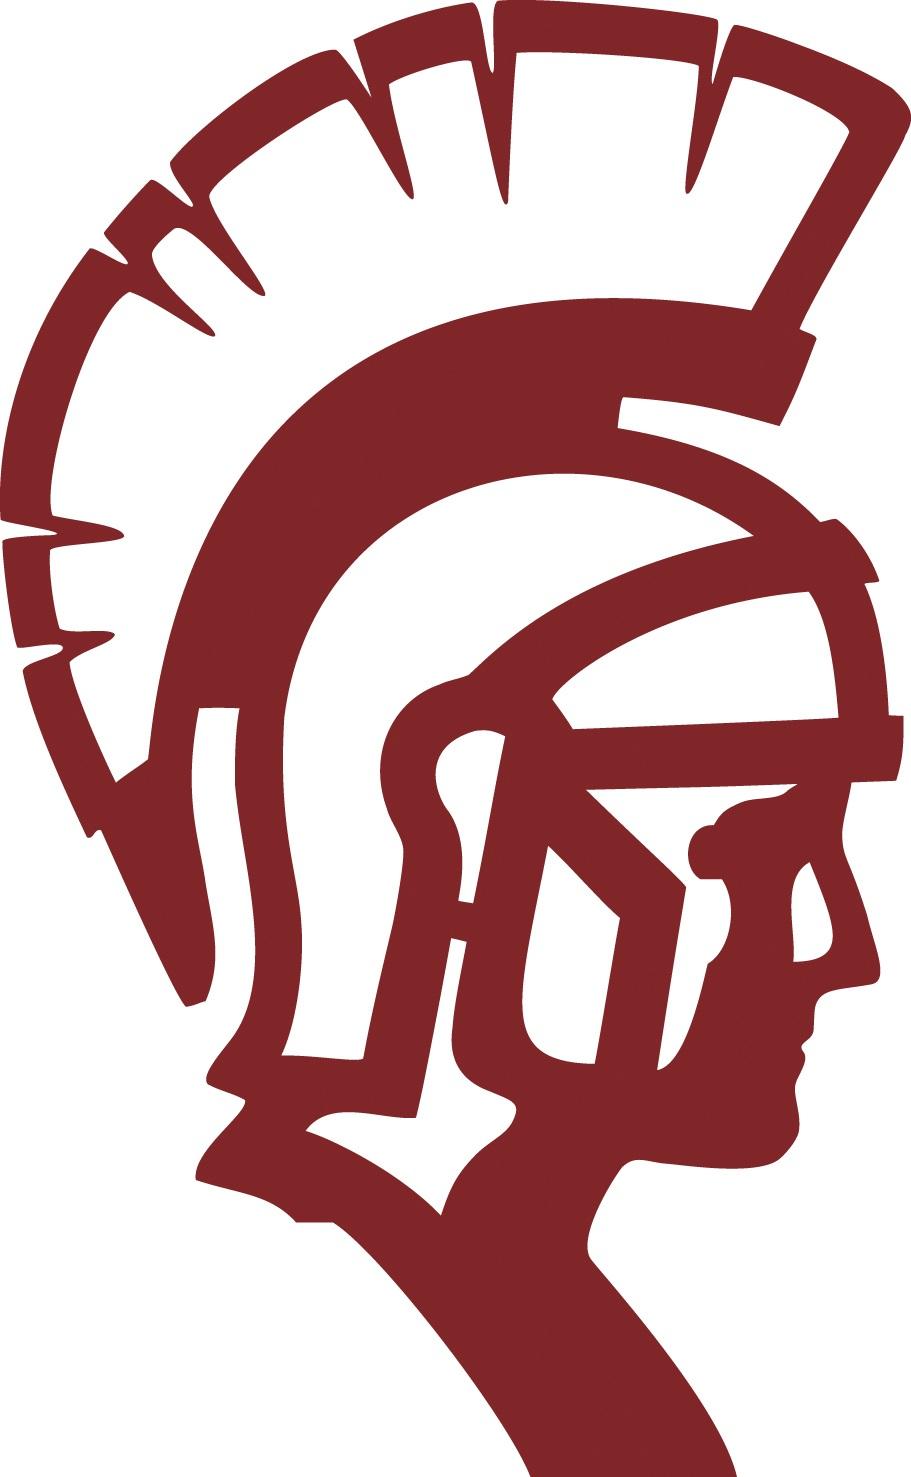 Black Spartan Head Logo - ClipArt Best